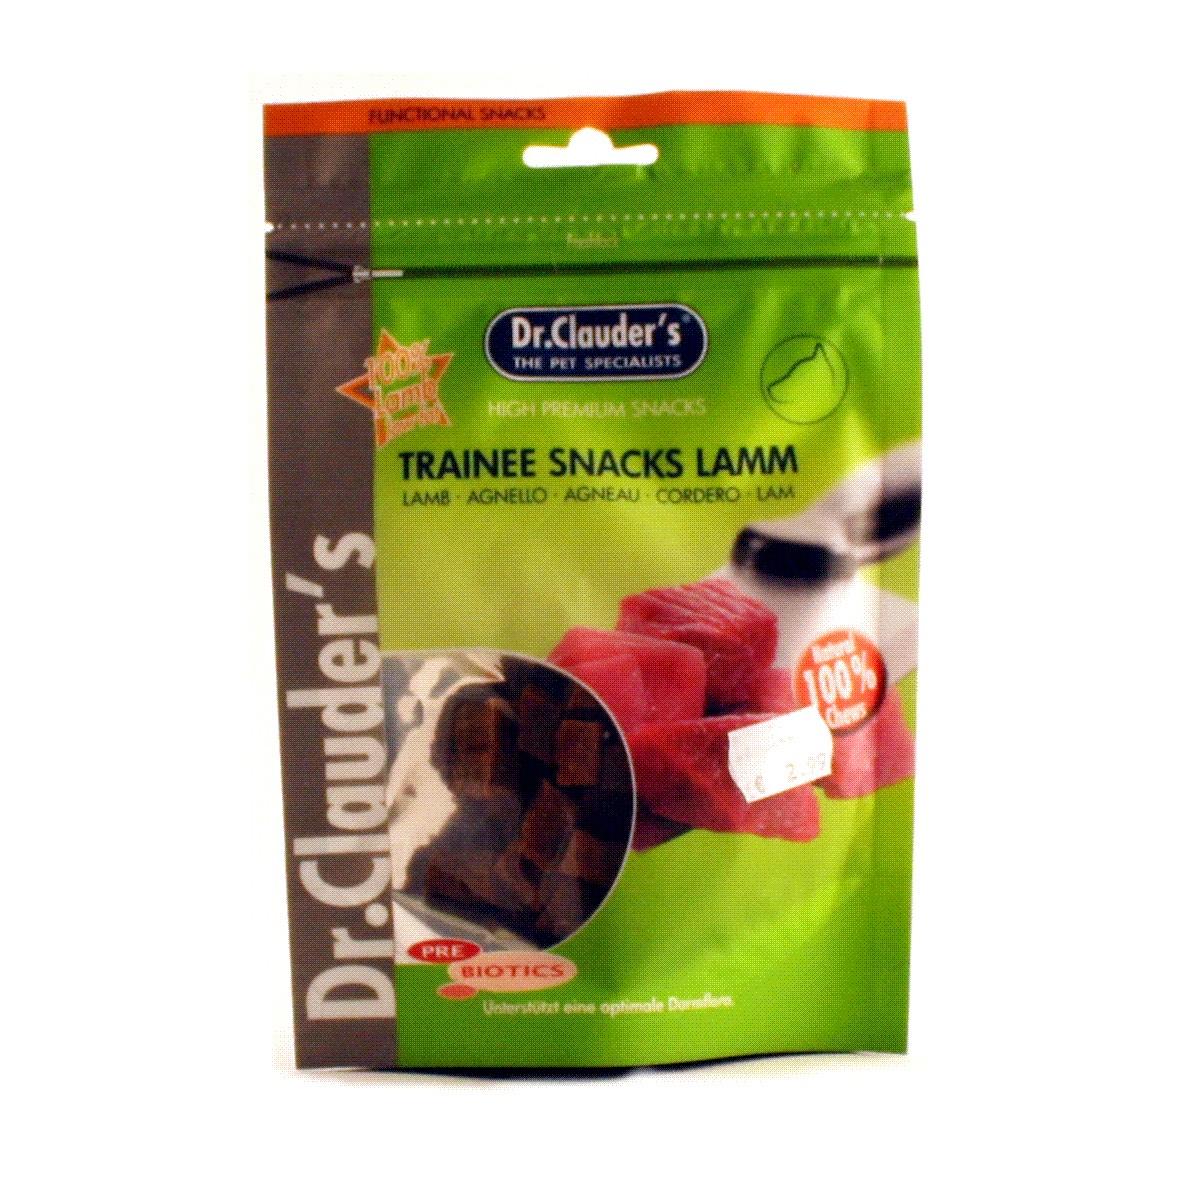 Dr. Clauders Trainee Snacks Lamm